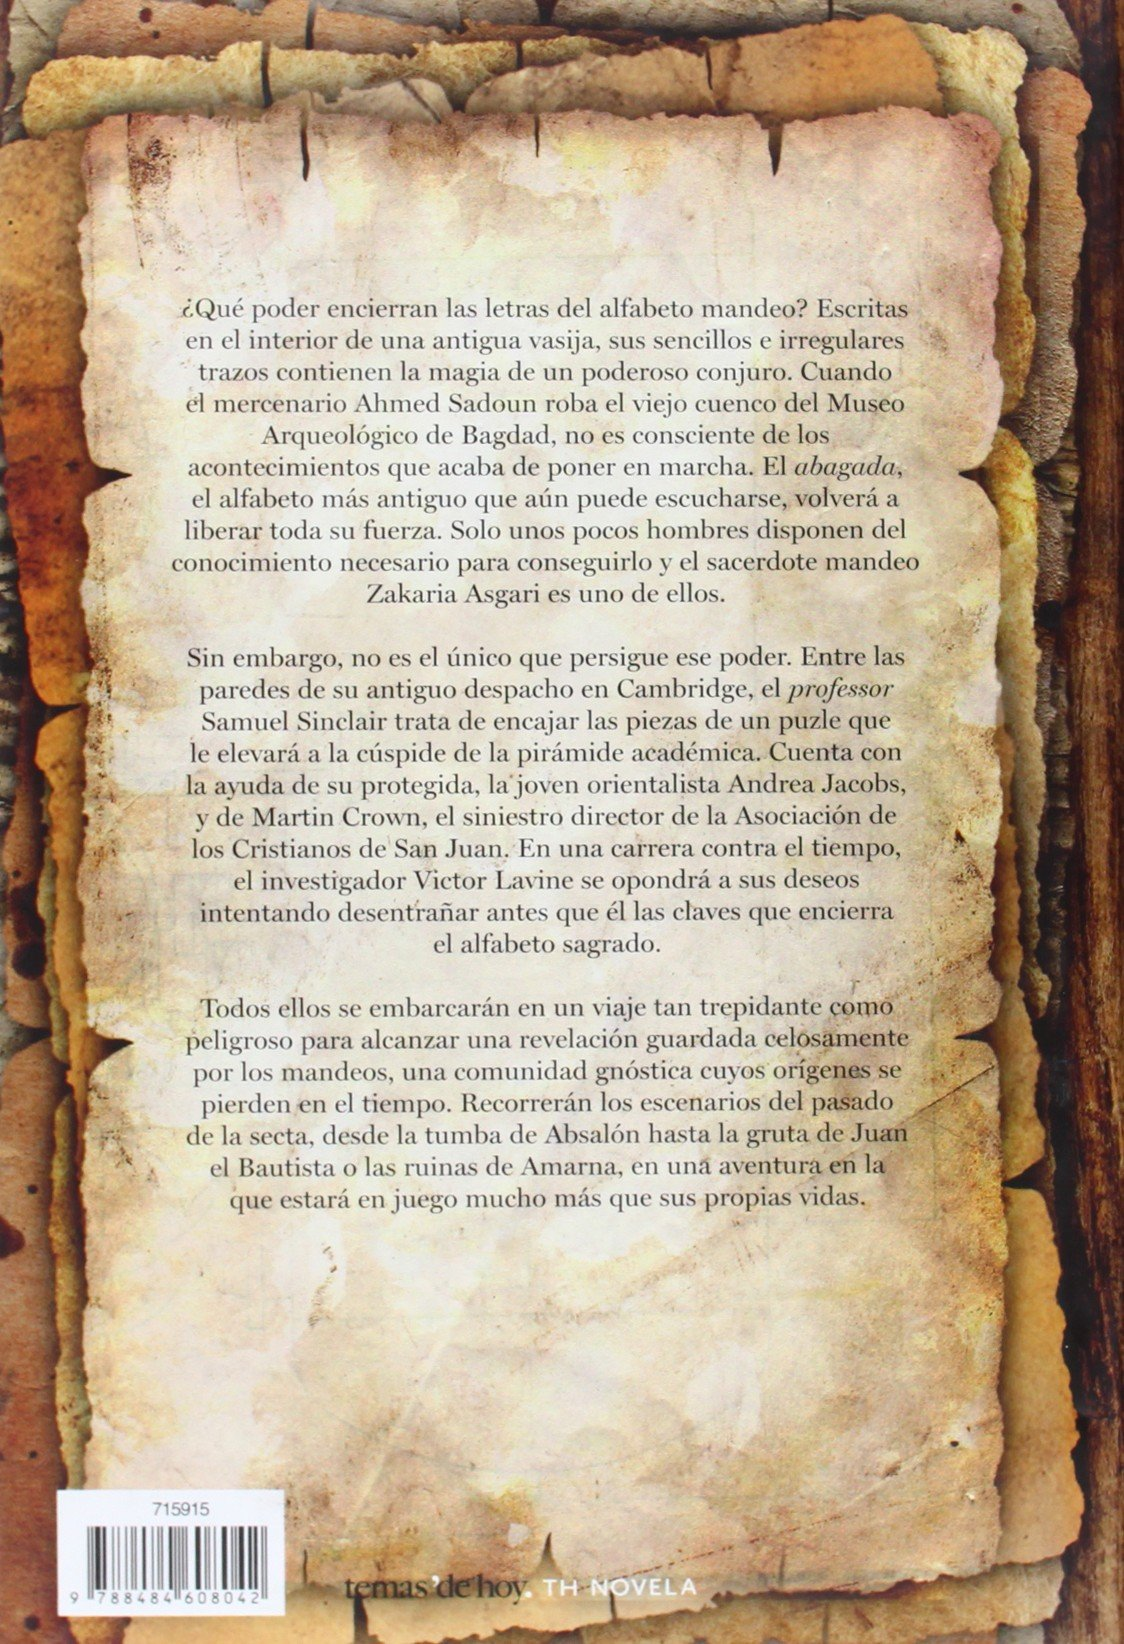 El alfabeto sagrado: Gemma Nieto Echevarría: 9788484608042: Amazon.com: Books